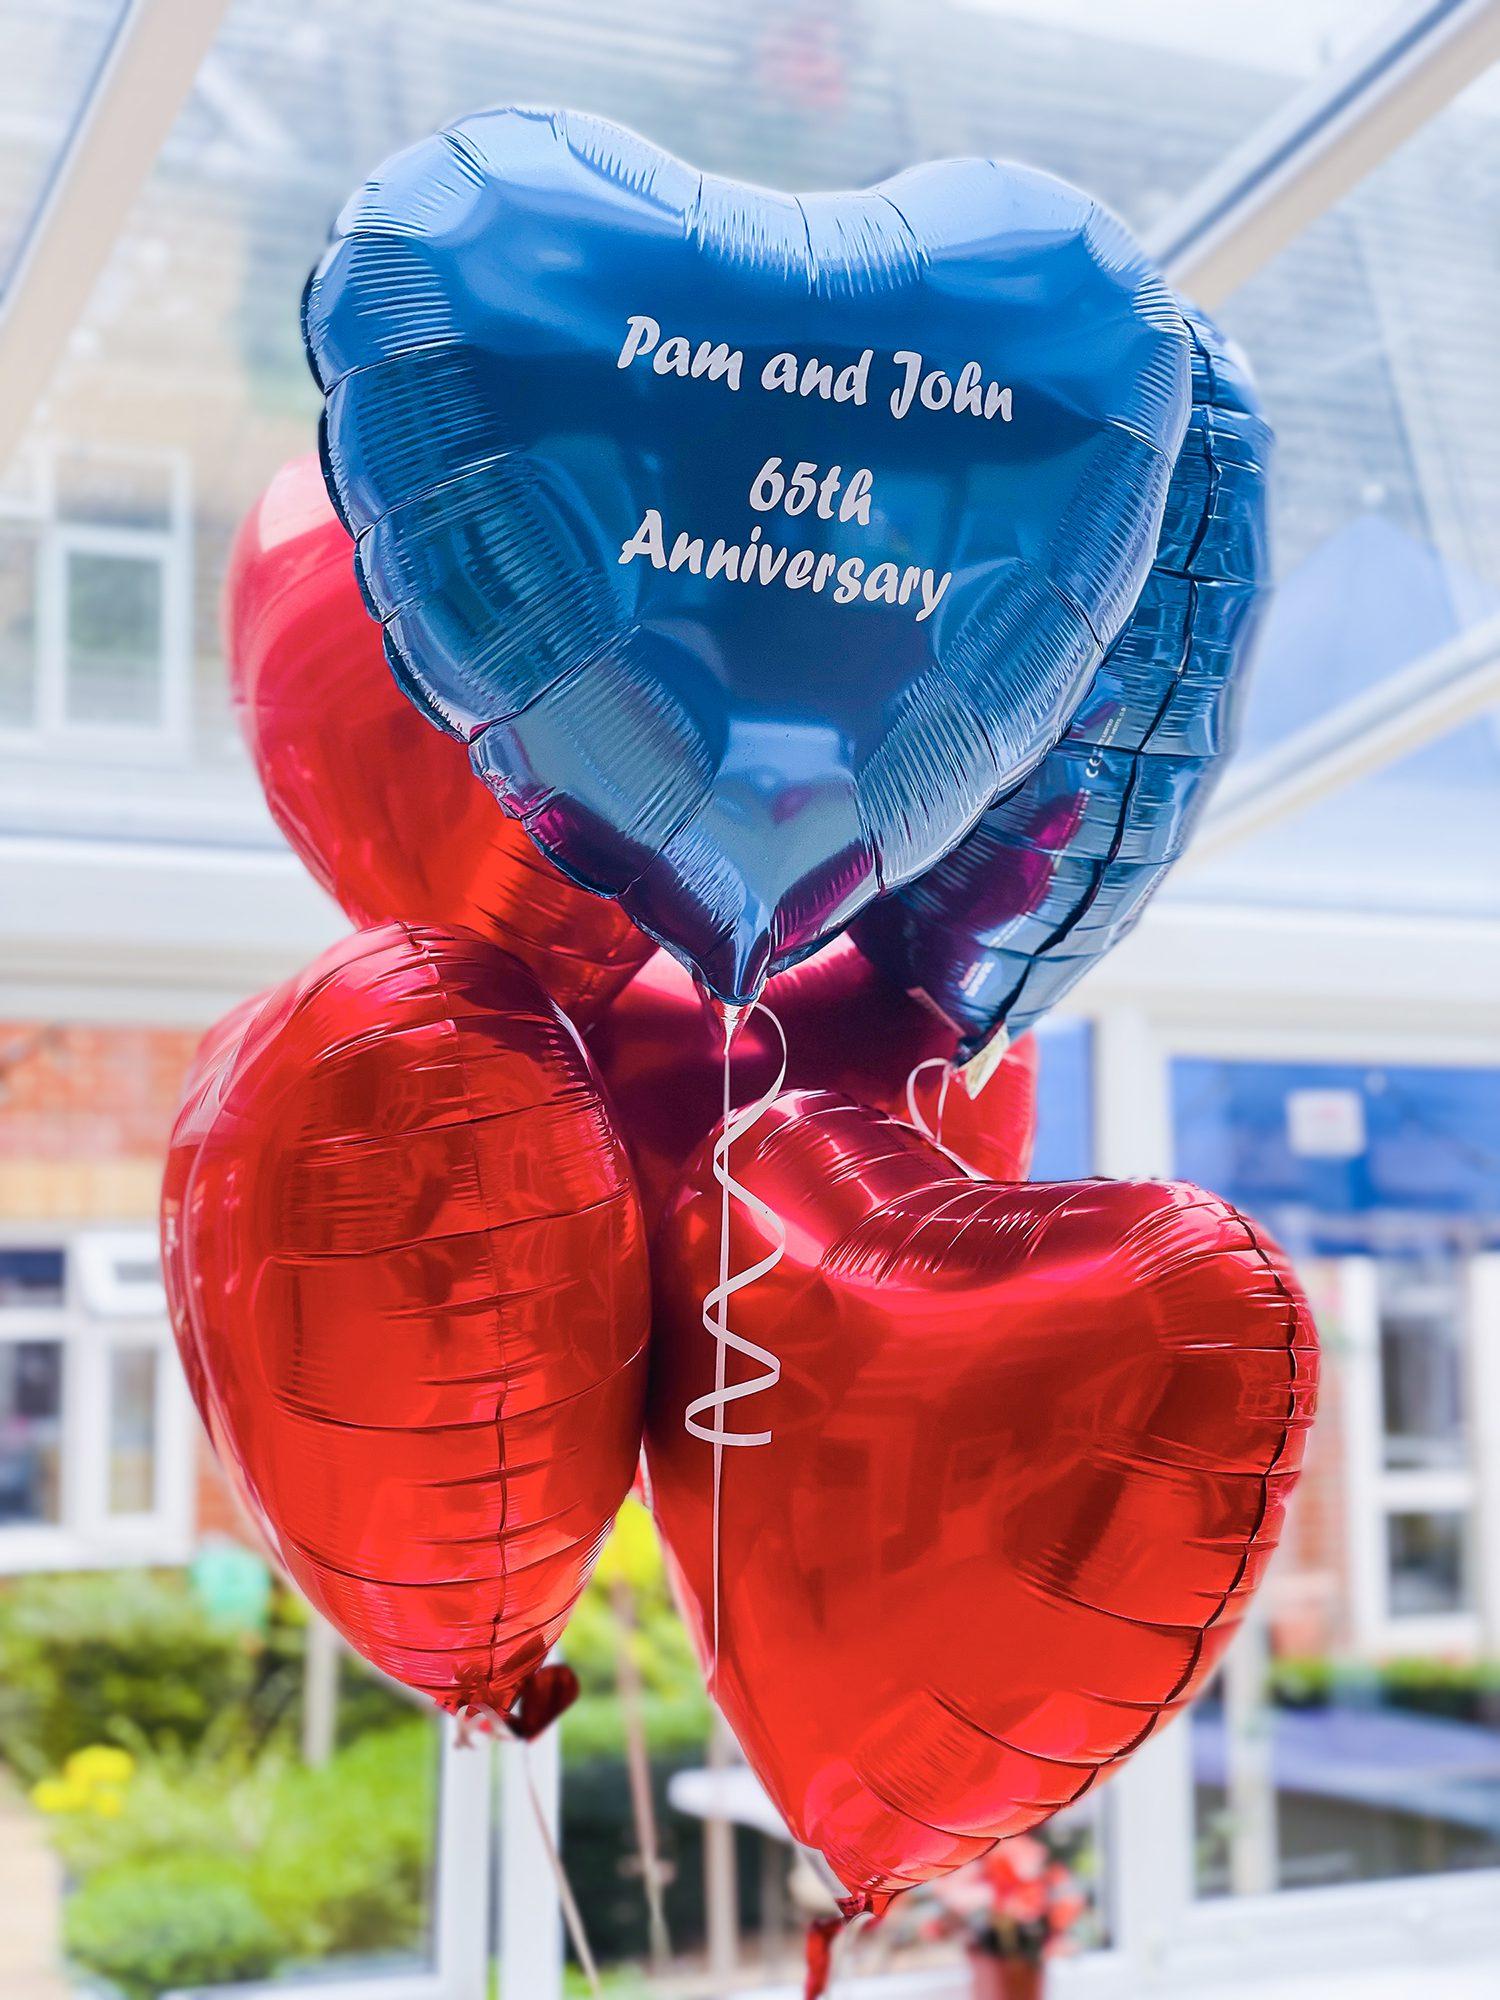 Anniversary balloons decorating Bernard Sunley care home